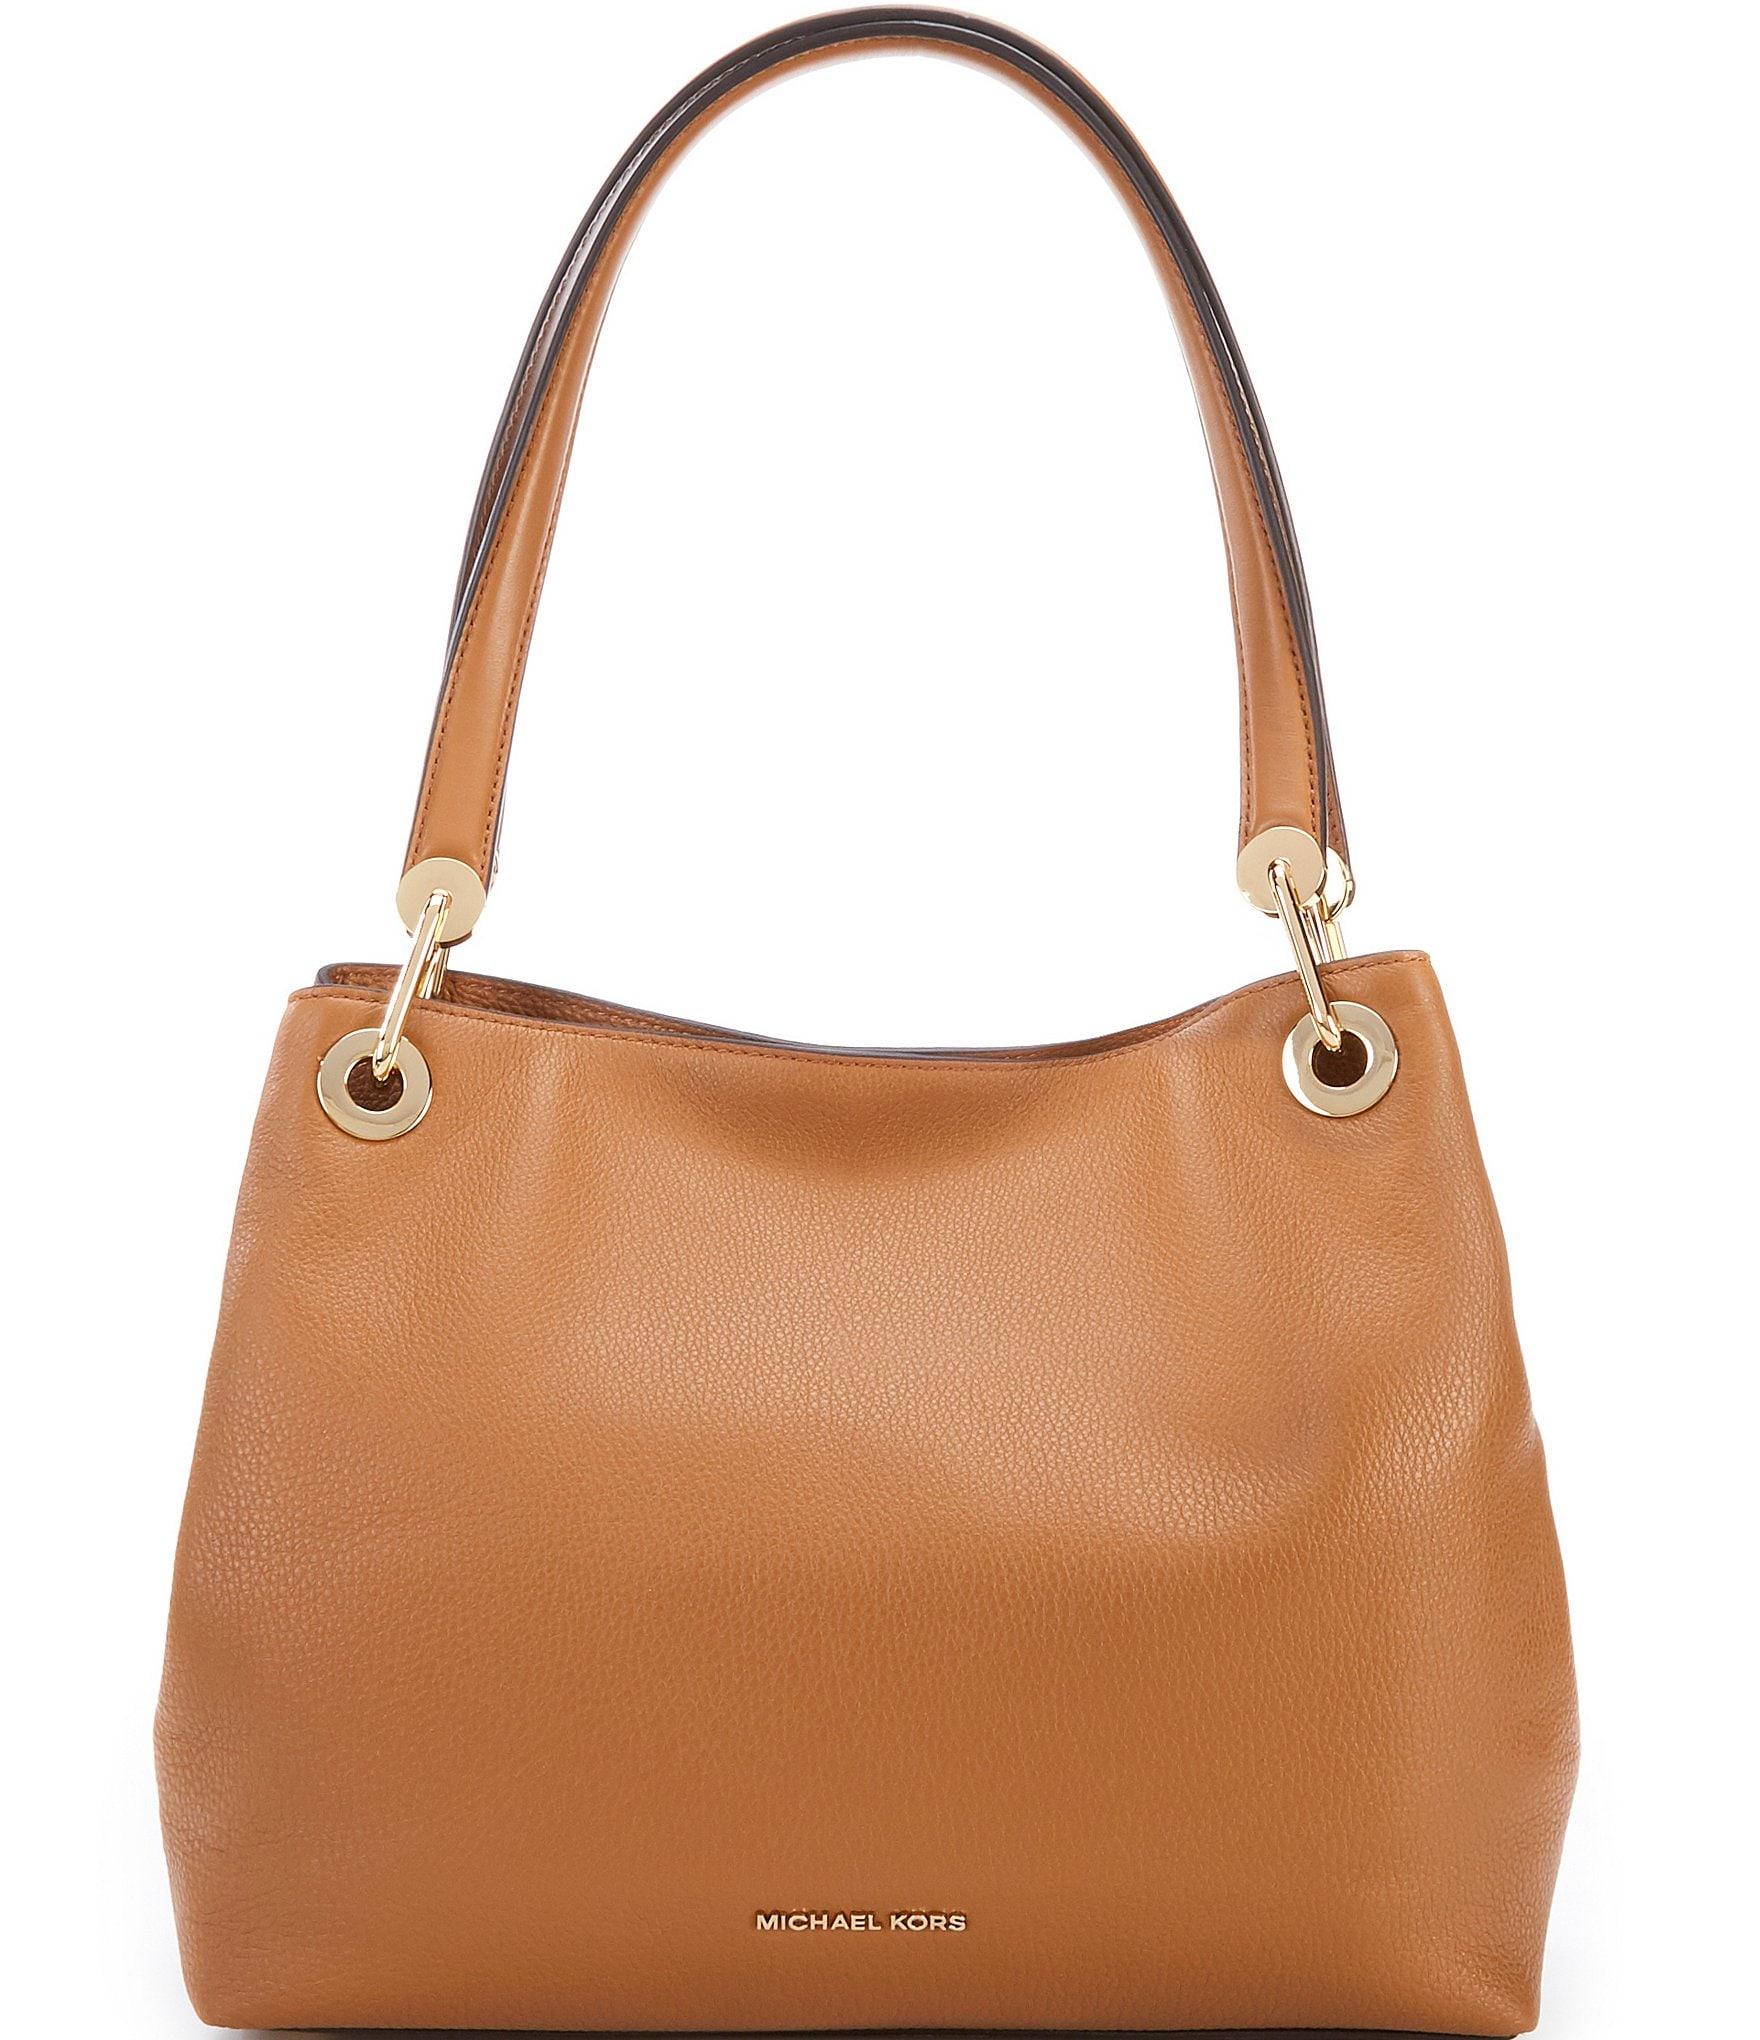 40c261a67c9fbe MICHAEL Michael Kors Tan Handbags, Purses & Wallets | Dillard's